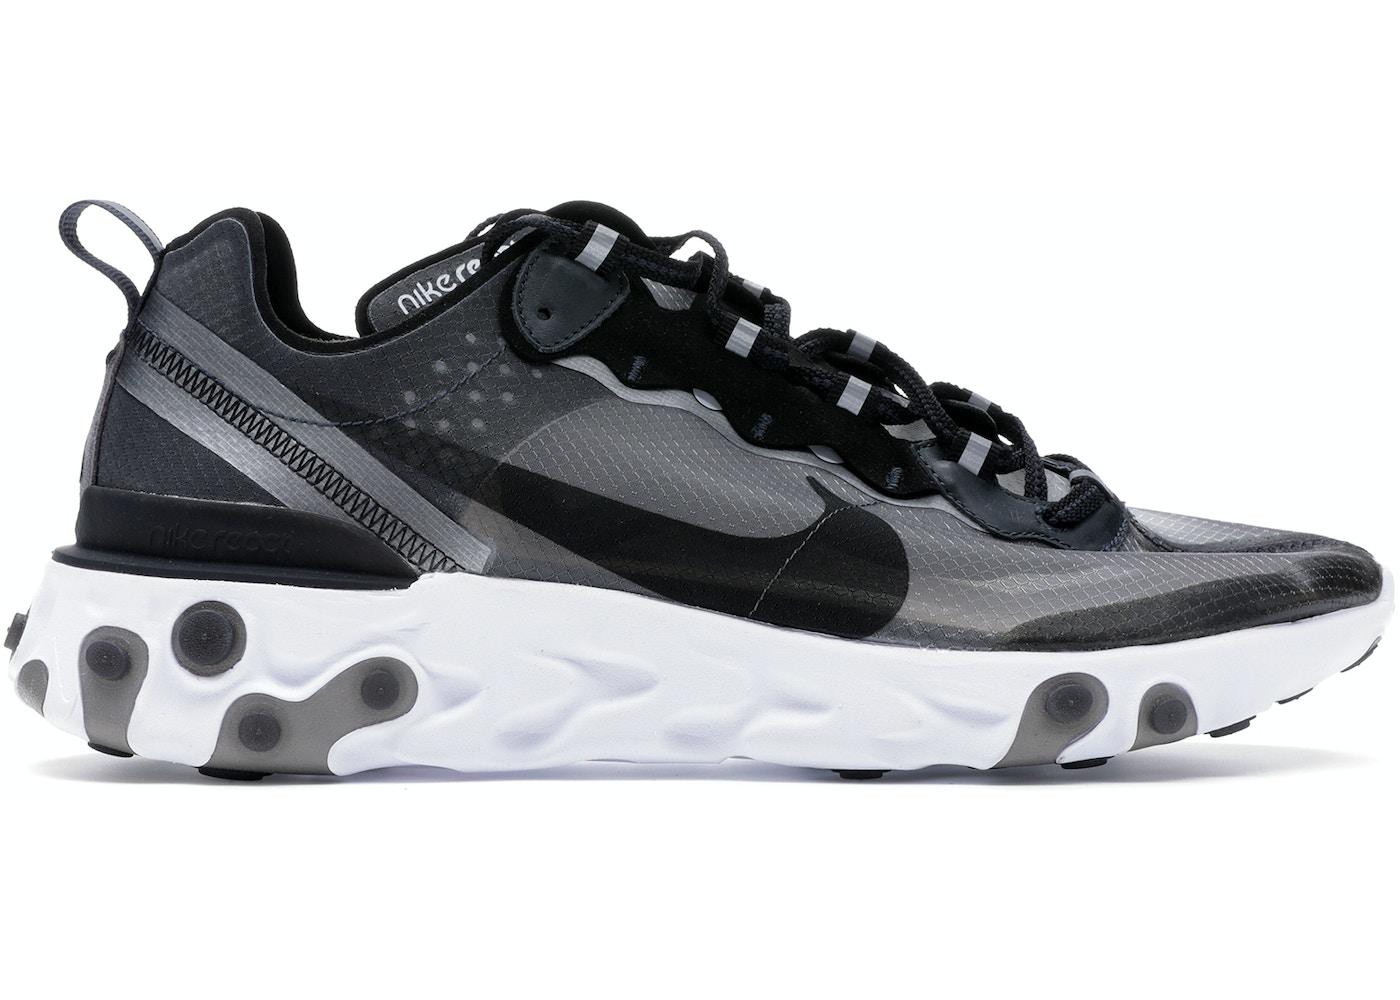 57a9c5ac65b7c Nike React Element 87 Anthracite Black